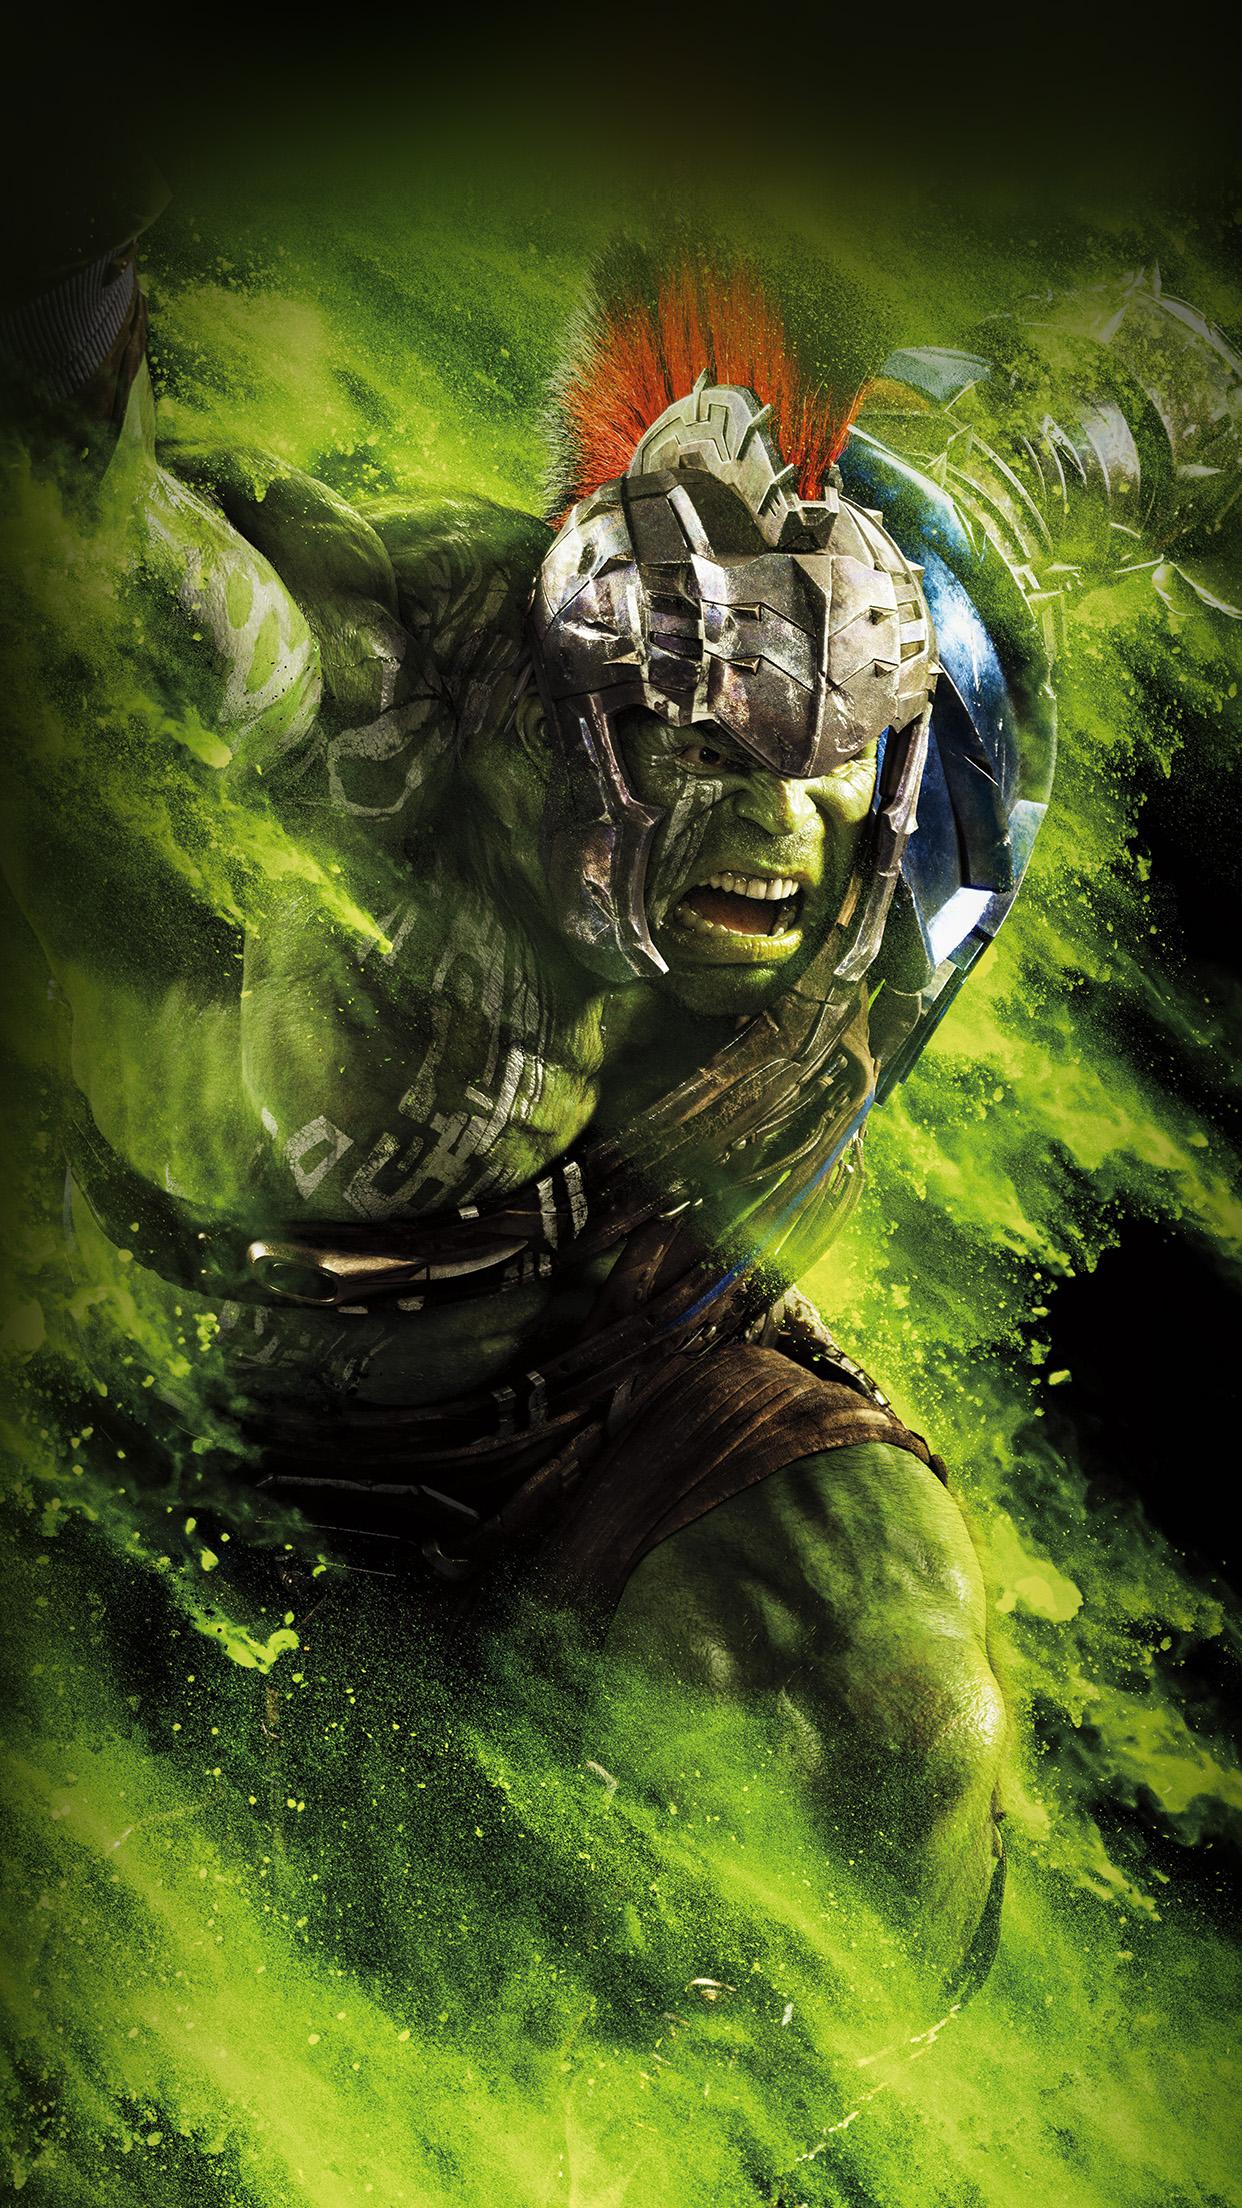 Crazy Anime Wallpaper Be57 Hulk Ragnarok Red Film Marvel Hero Art Illustration